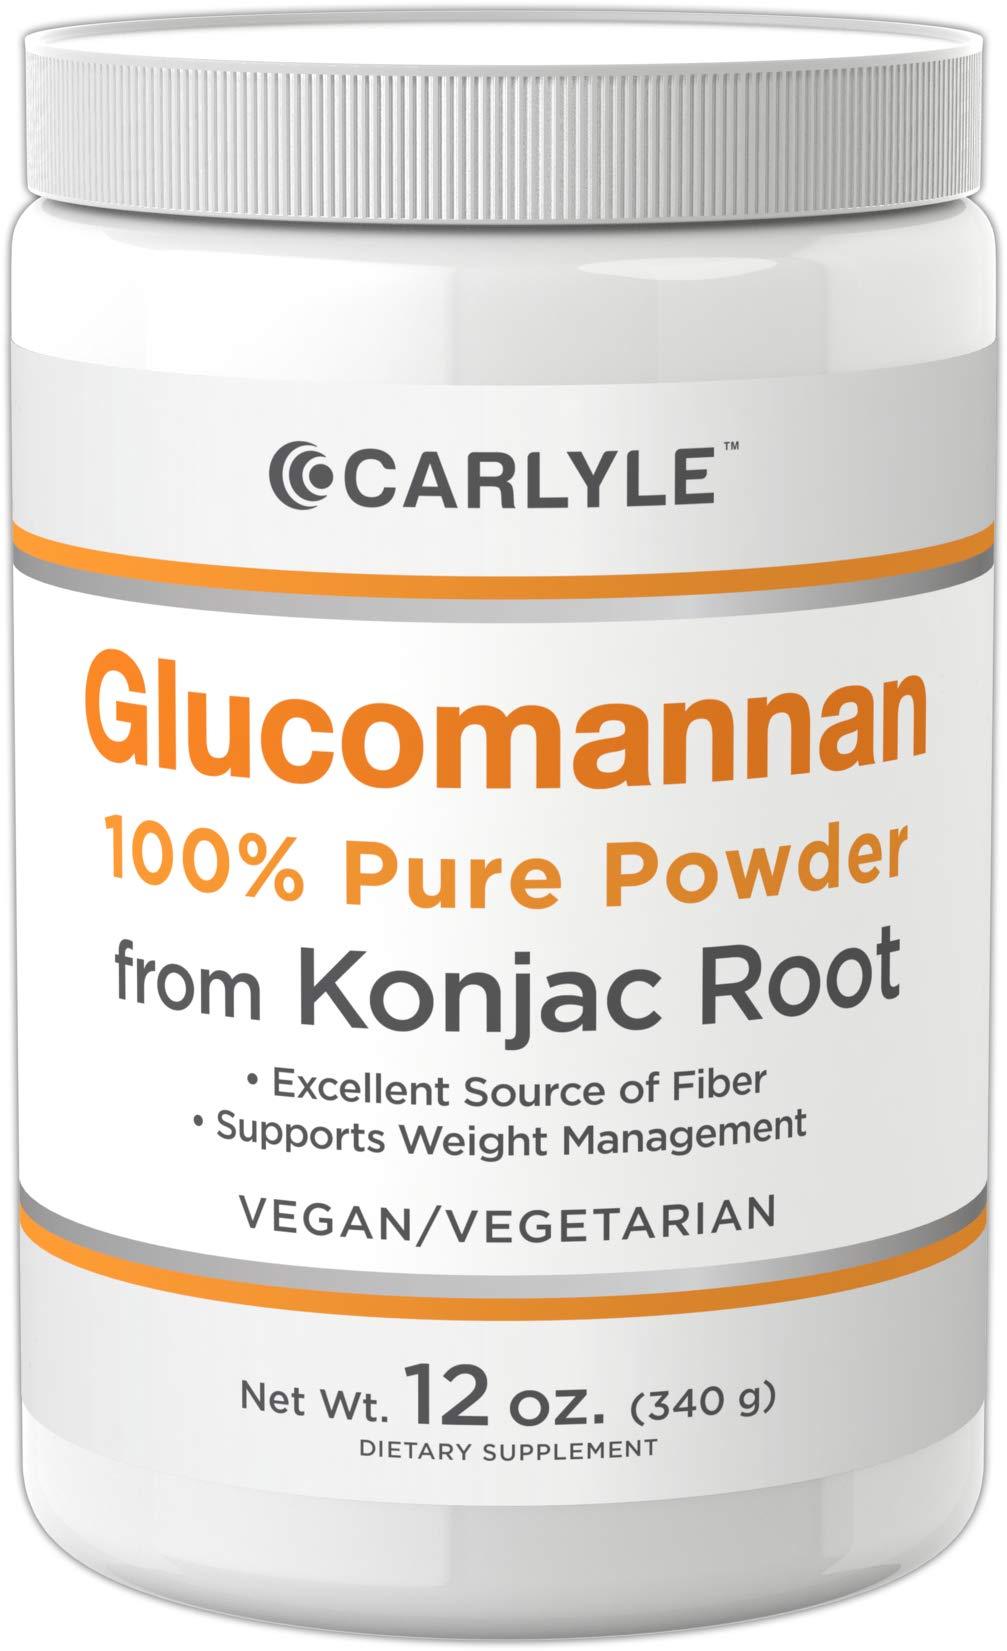 Glucomannan Powder | 12 oz | Vegan & Vegetarian | Non-GMO, Gluten Free | 100% Pure Konjac Powder Supplement | by Carlyle by Carlyle